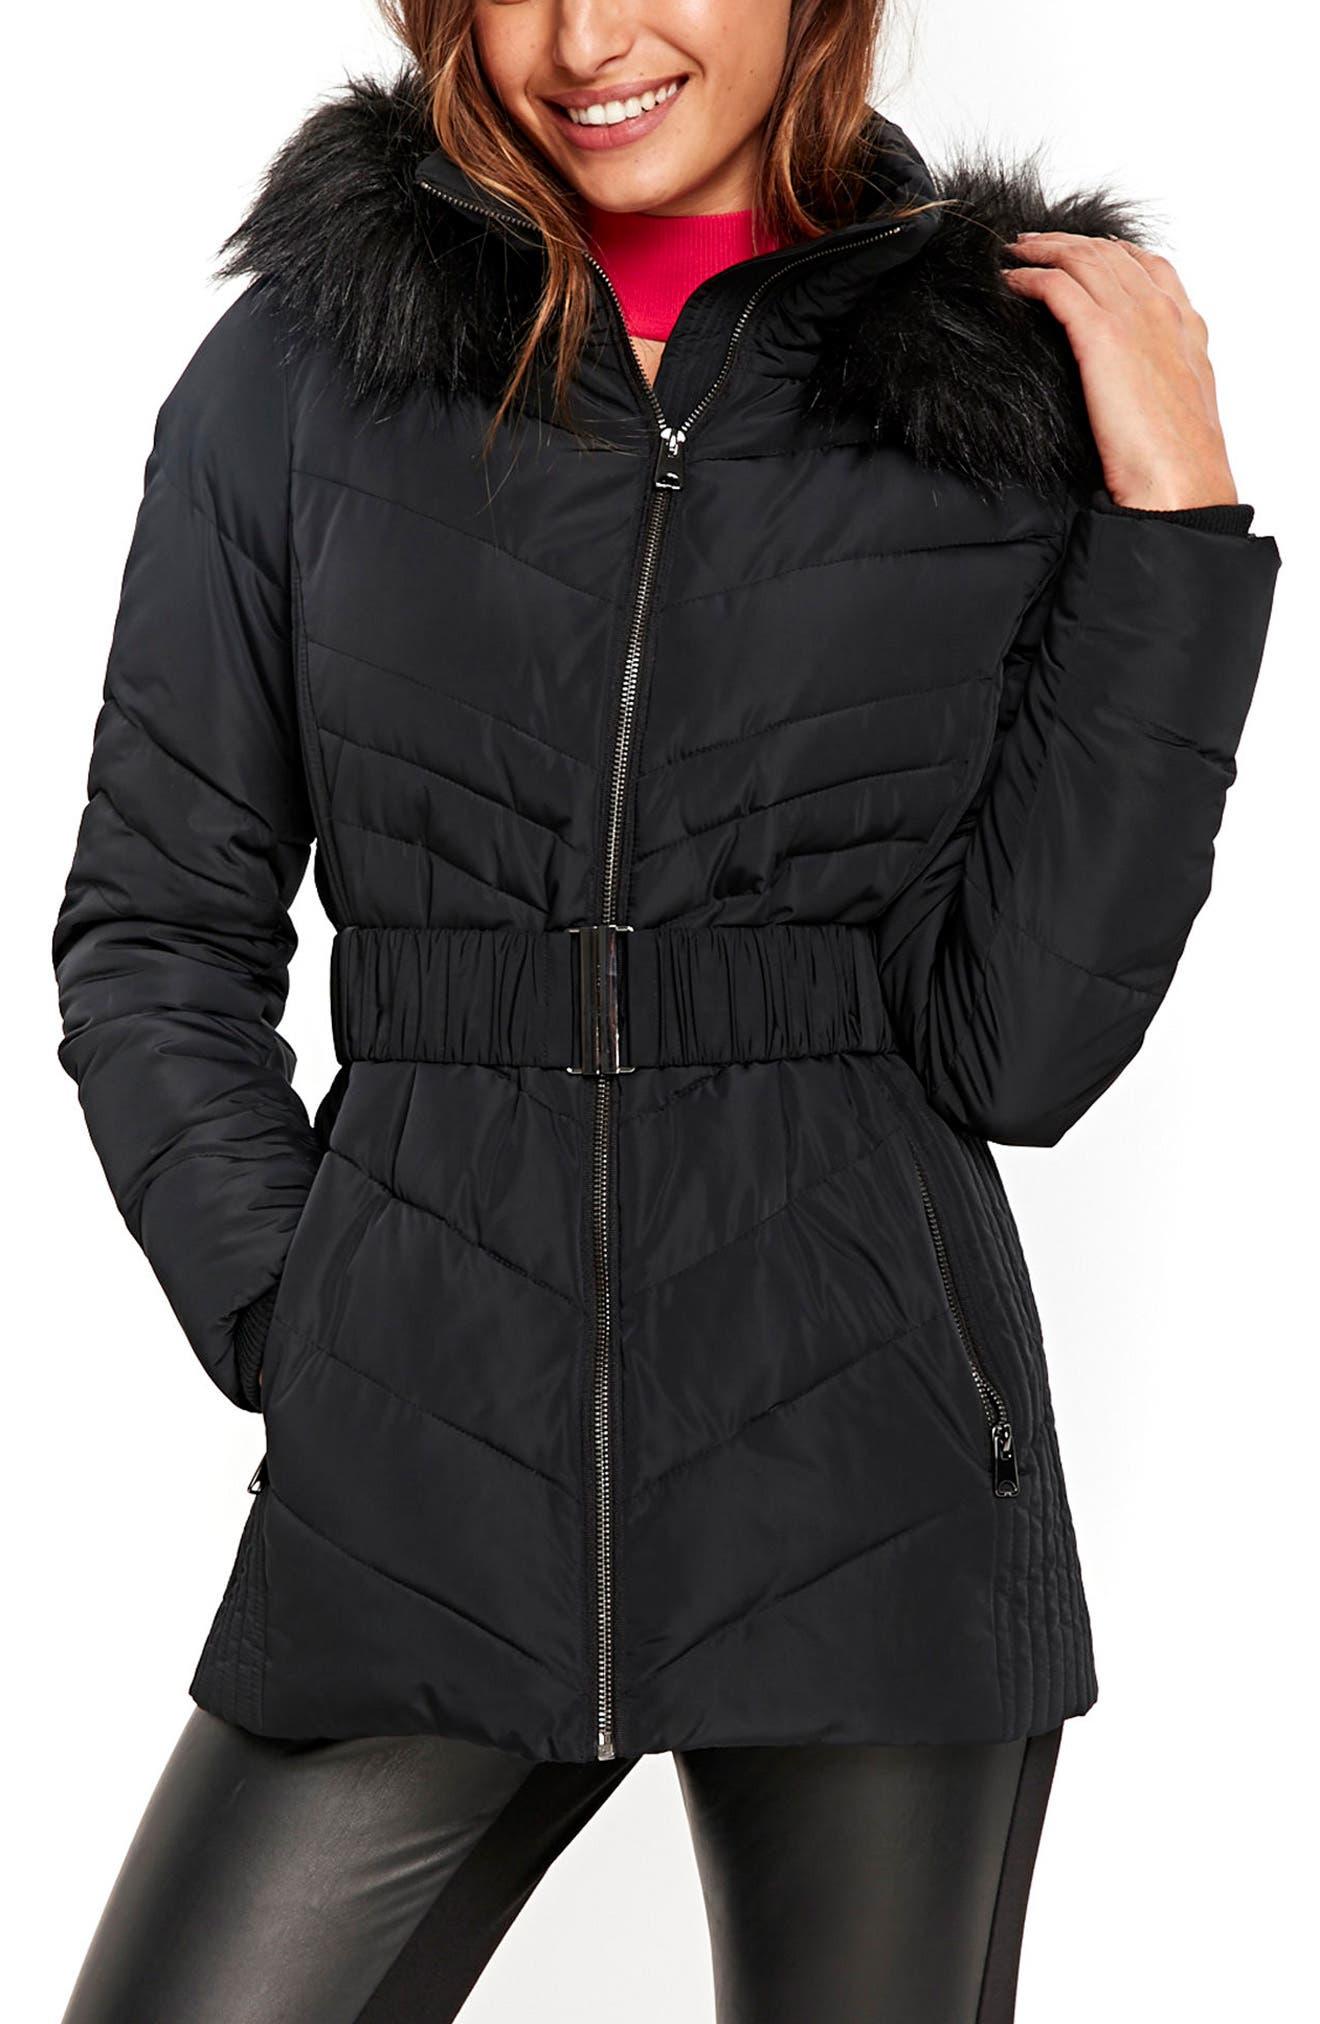 Main Image - Wallis Water Repellent Quilted Puffer Coat with Faux Fur Trim (Regular & Petite)